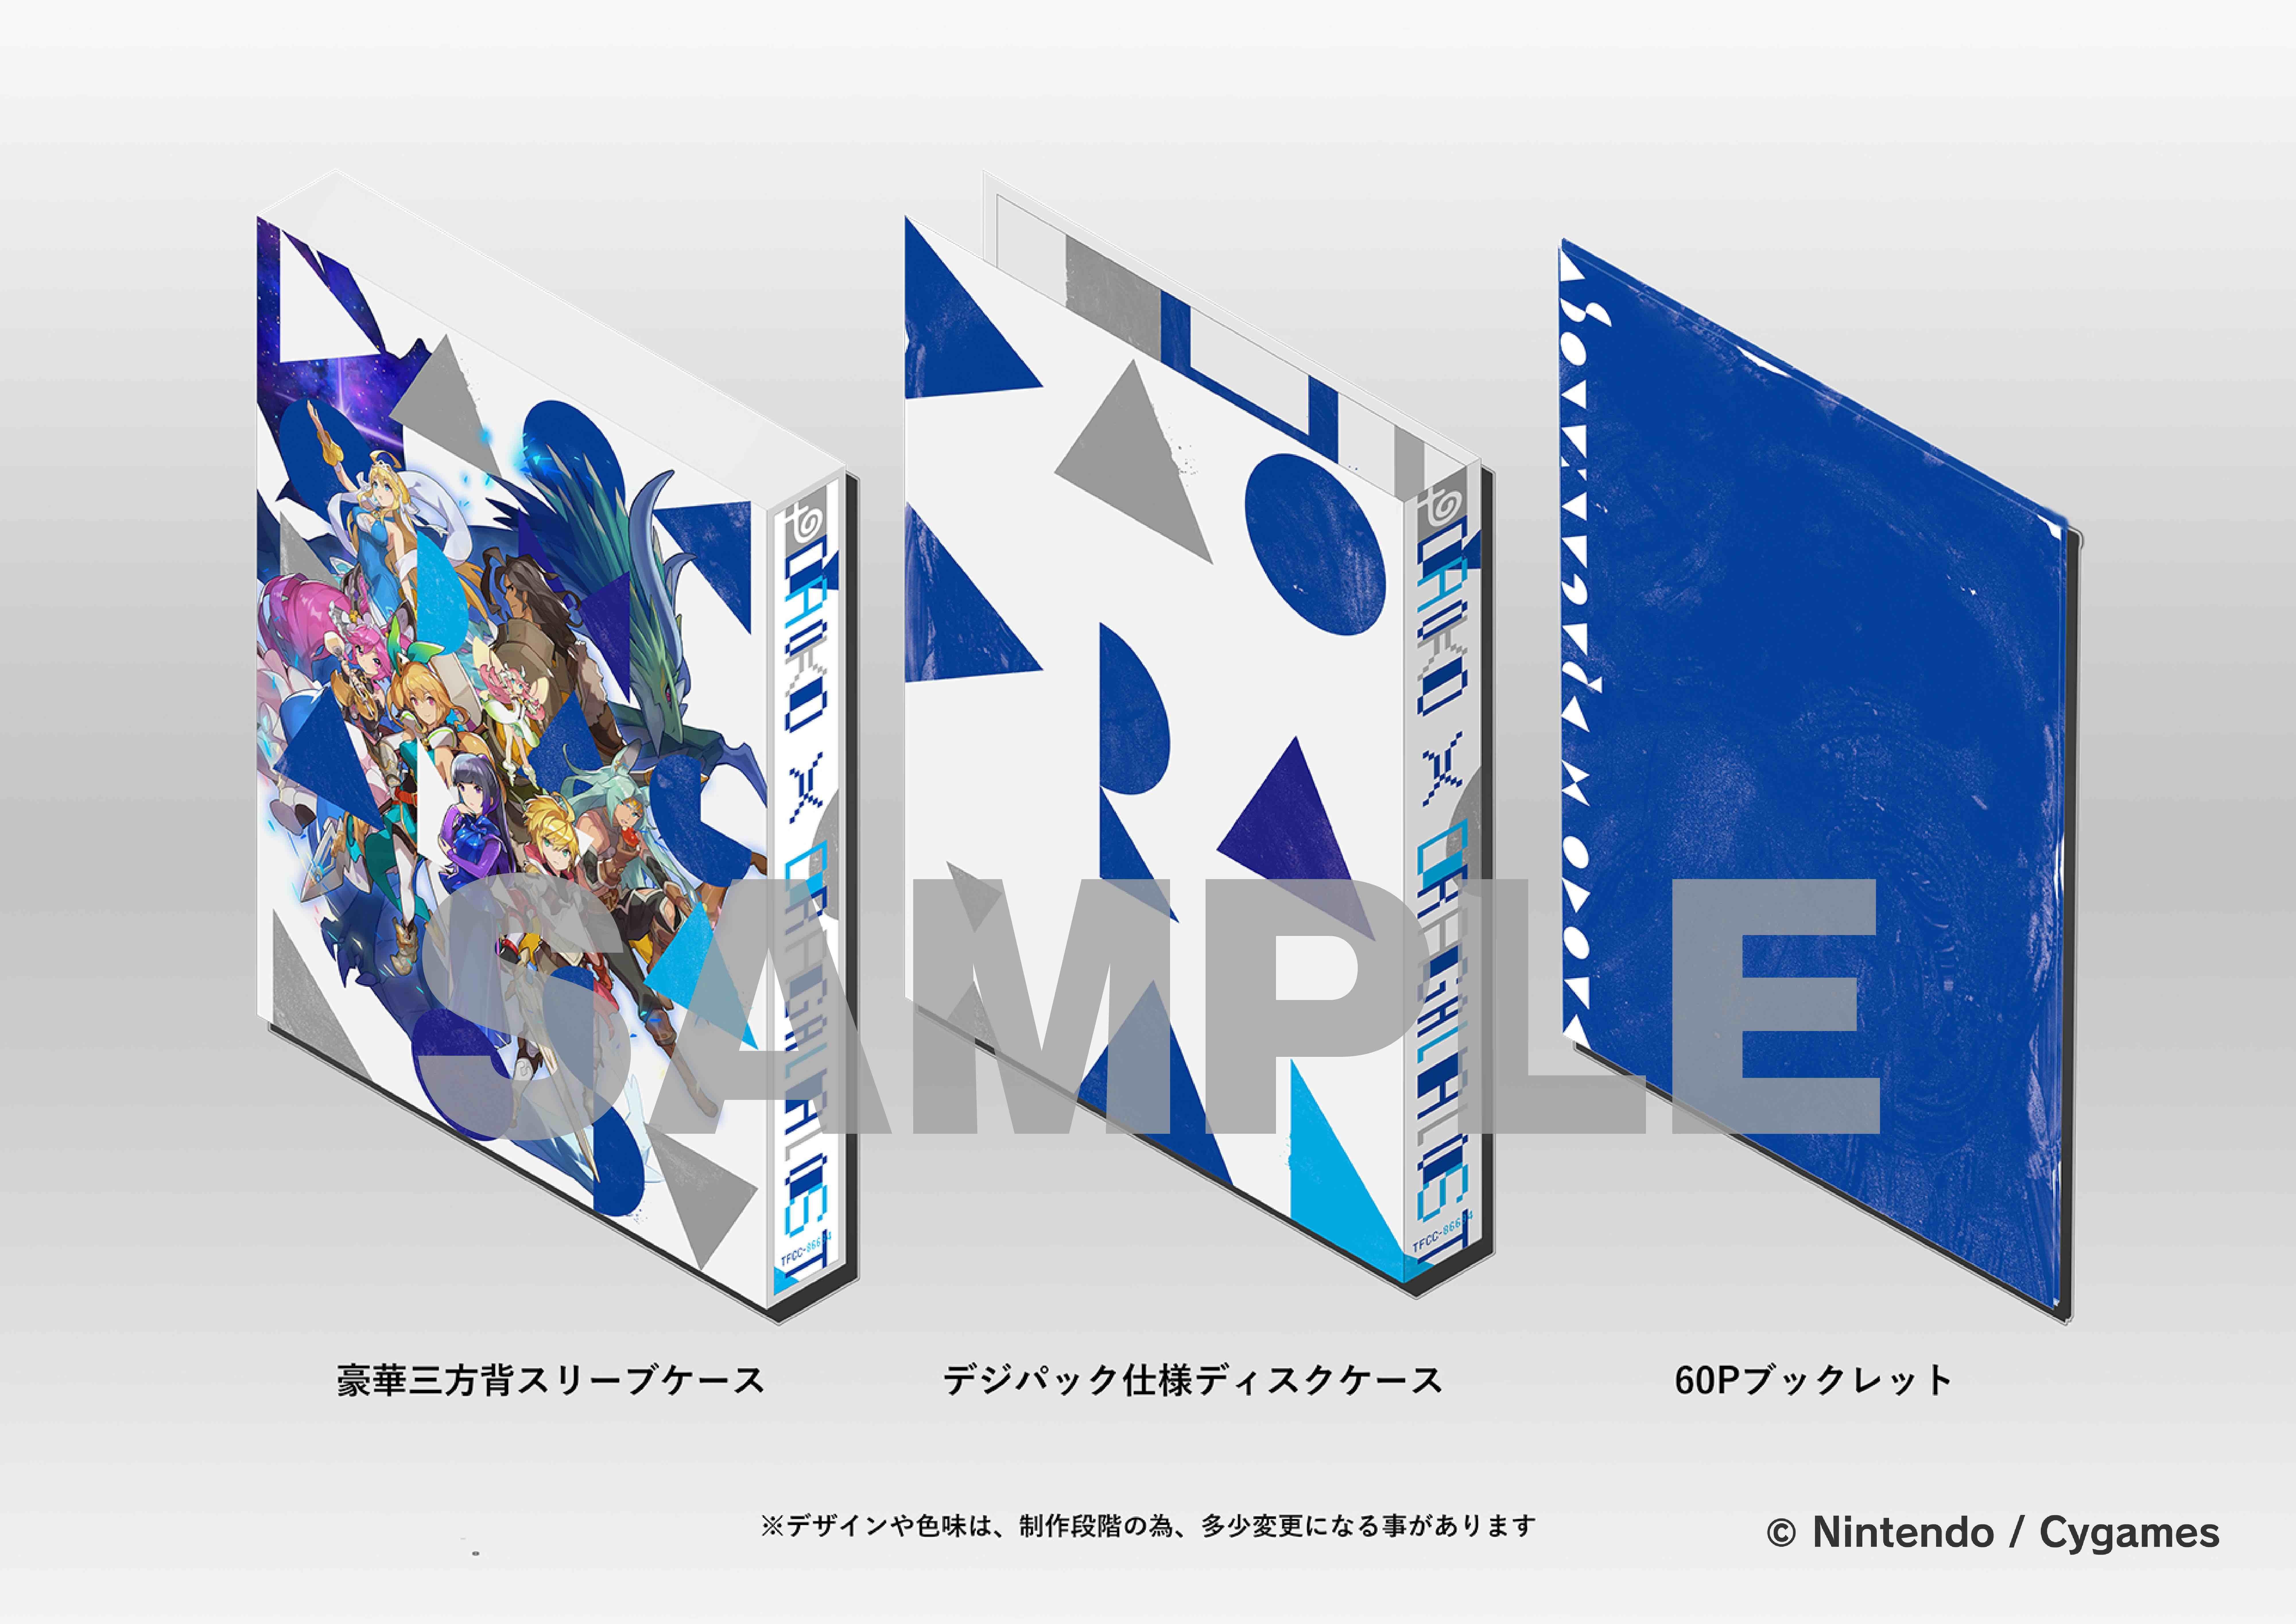 「DAOKO × ドラガリアロスト」初回限定盤 図解